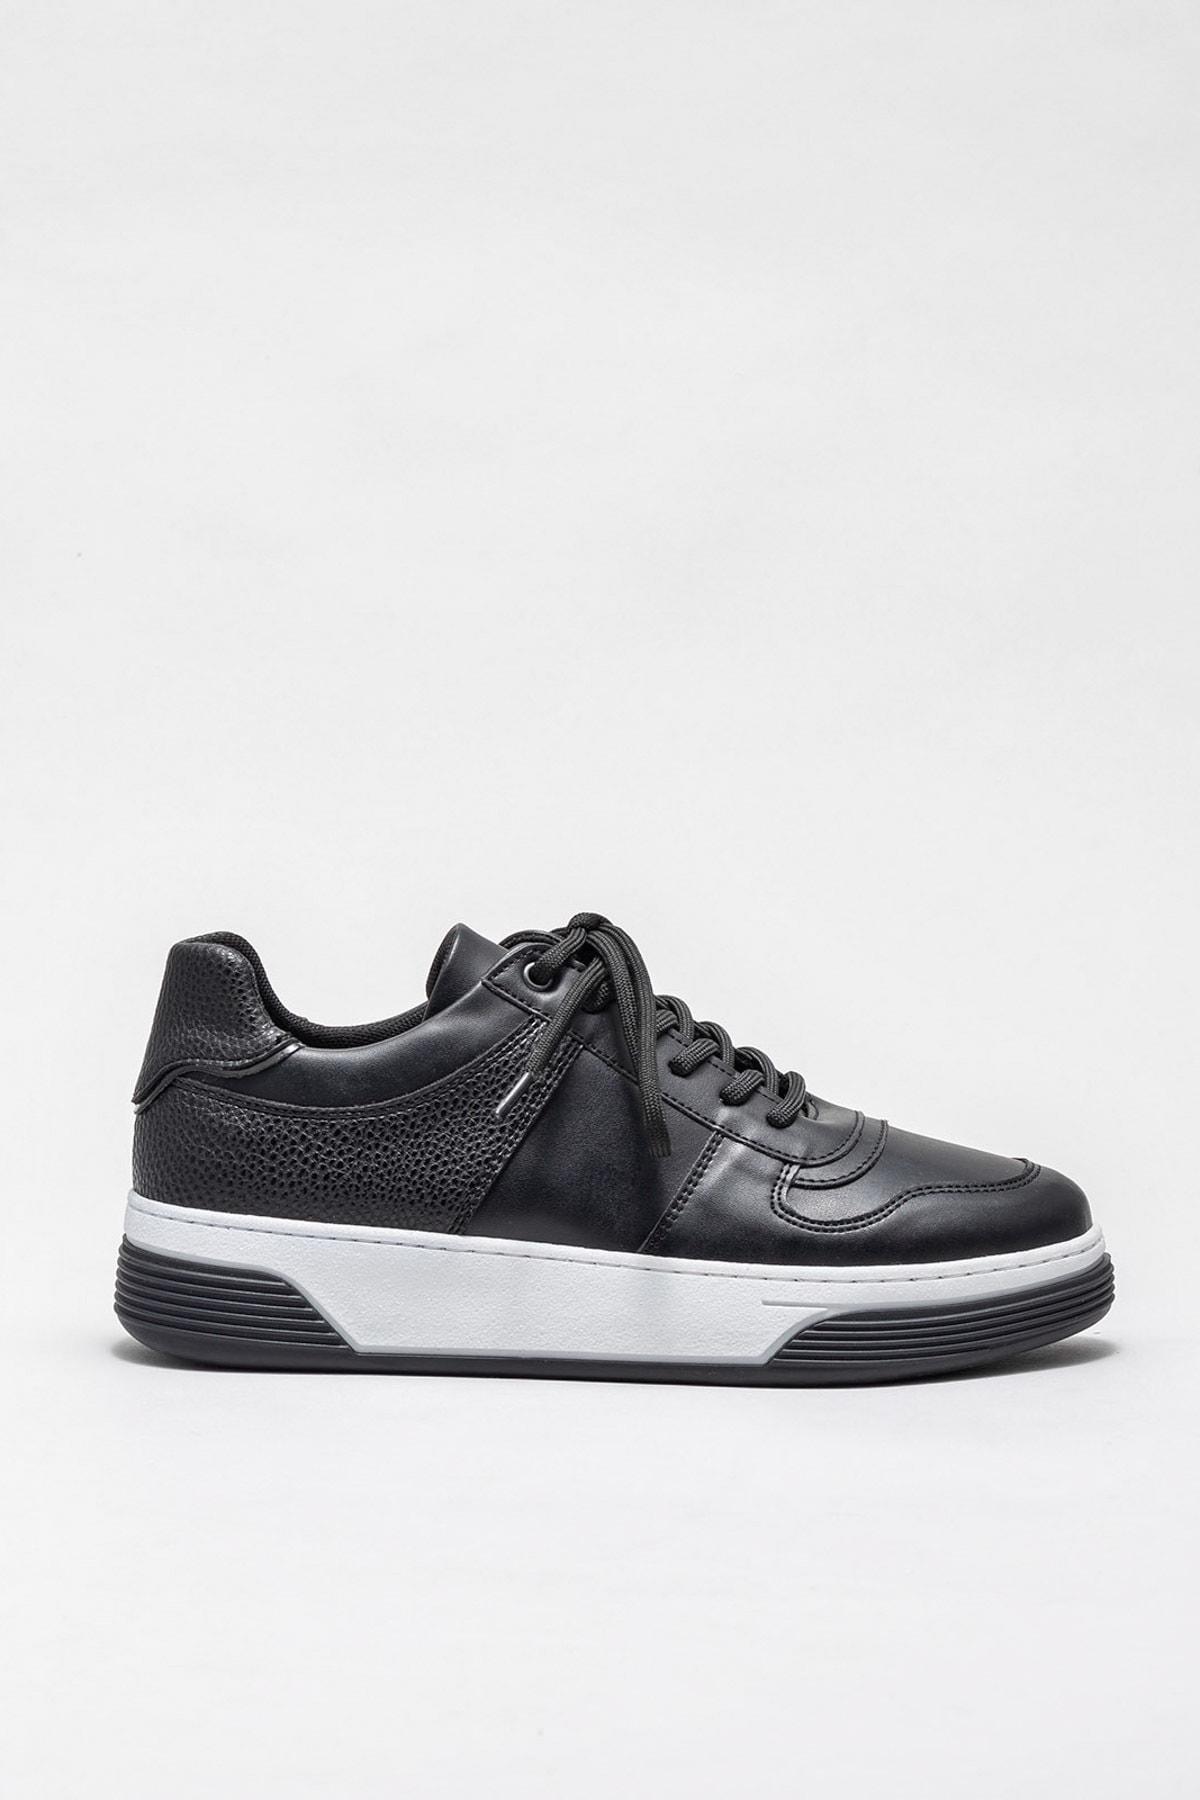 Elle Shoes Kadın Sebert Sıyah Sneaker 20KRG09 1